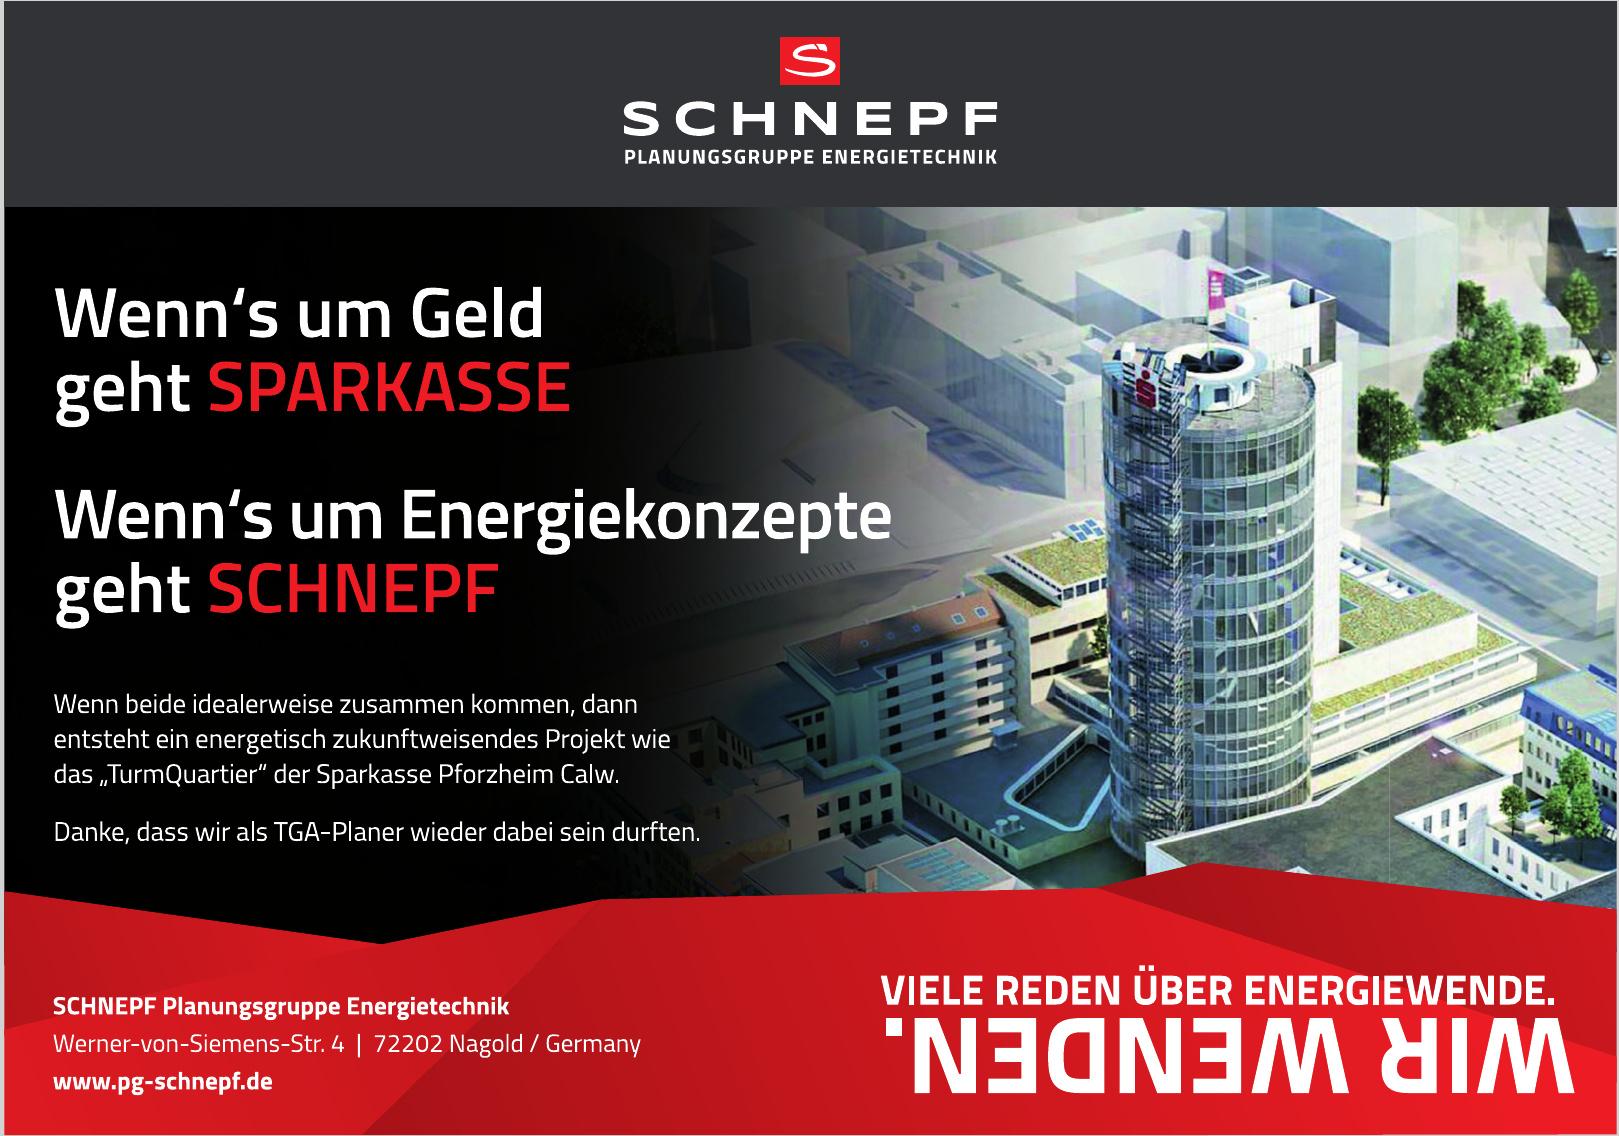 SCHNEPF Planungsgruppe Energietechnik